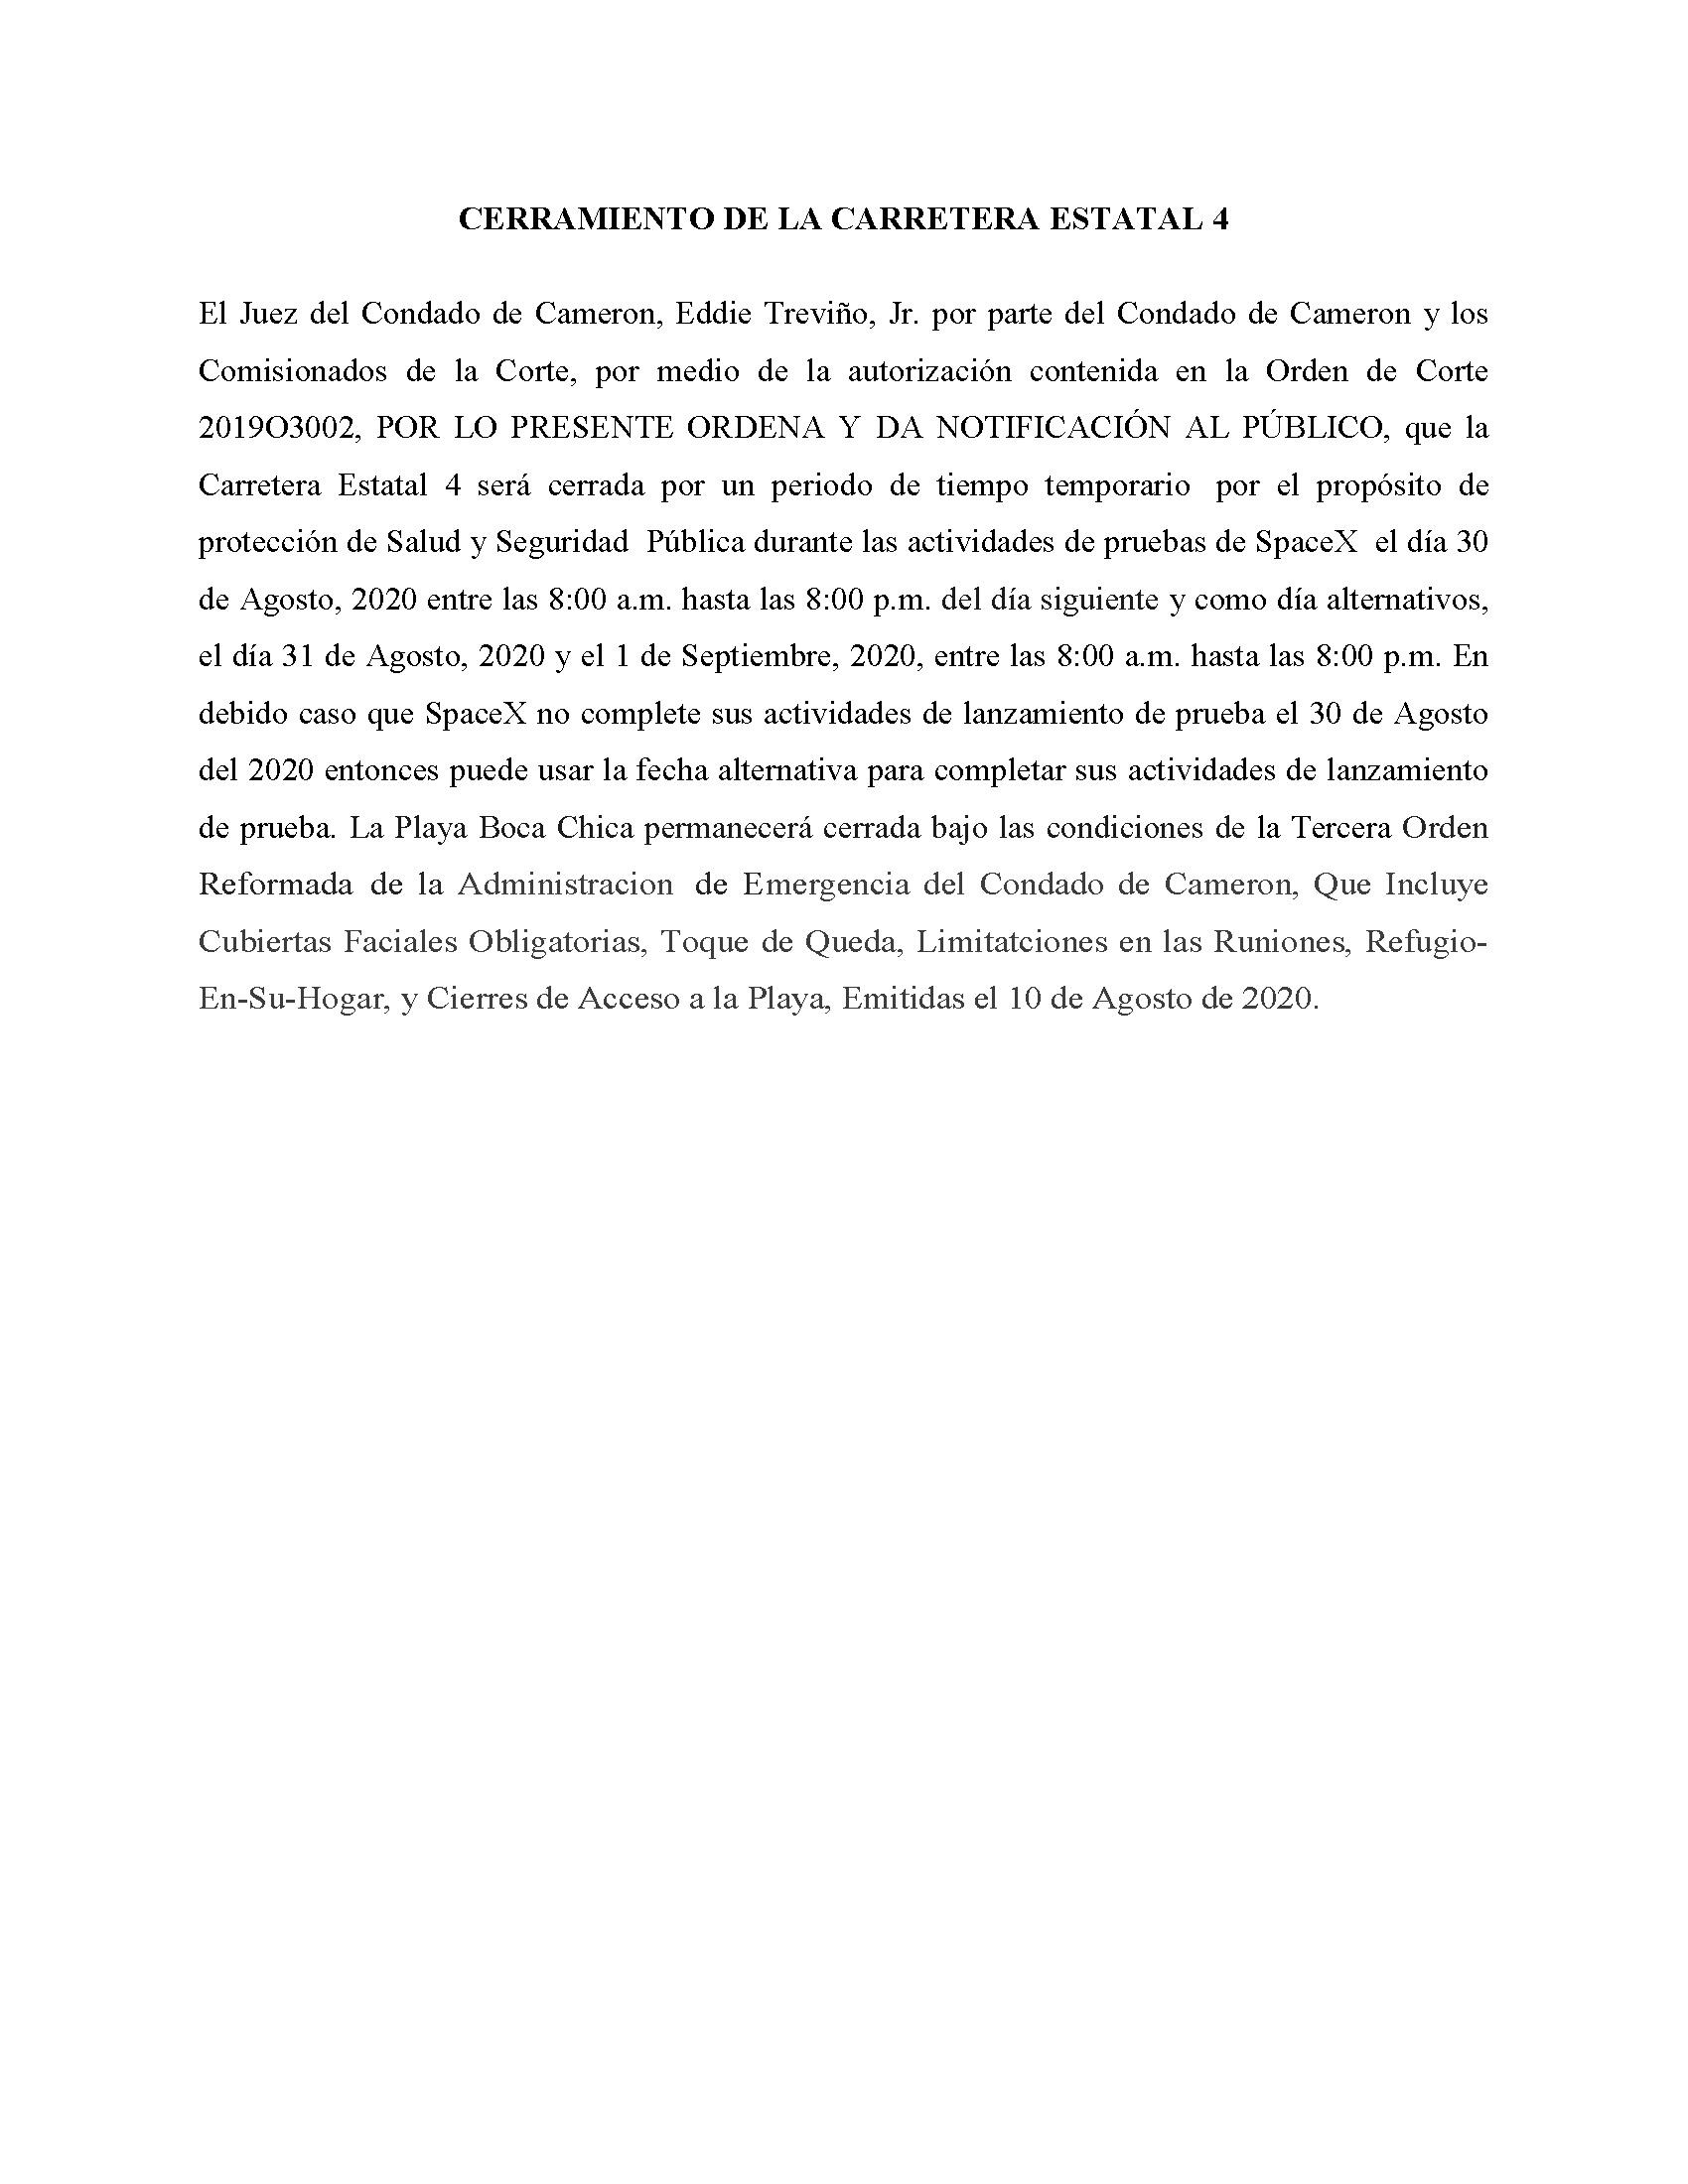 ORDER.CLOSURE OF HIGHWAY 4.SPANISH.08.30.20